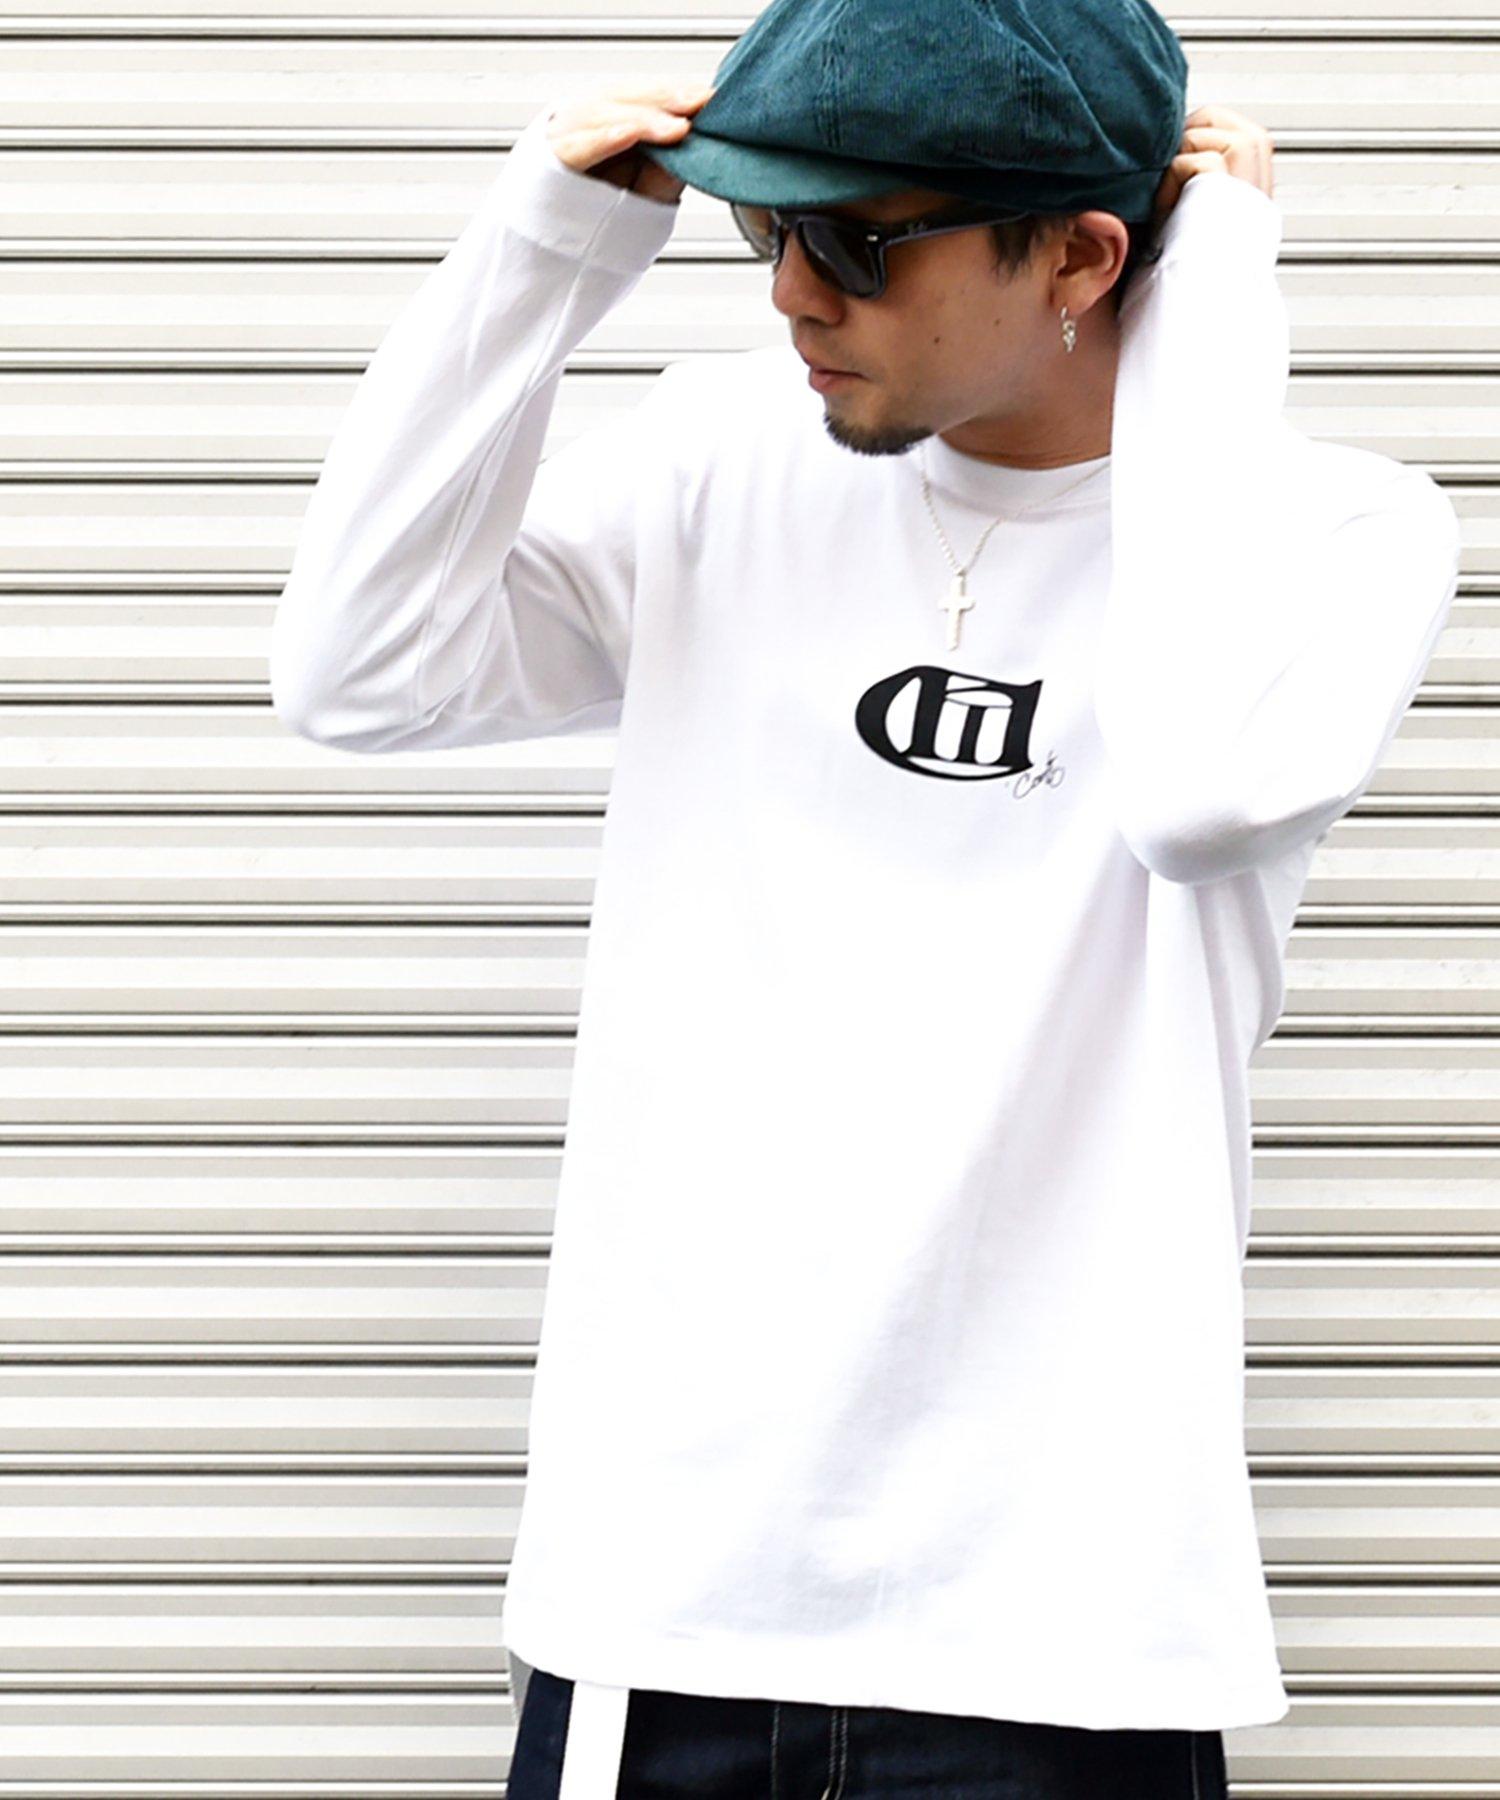 'Conti(コンマコンティ)COMMA CONTI TOKYO L/S T-Shirt / ホワイト